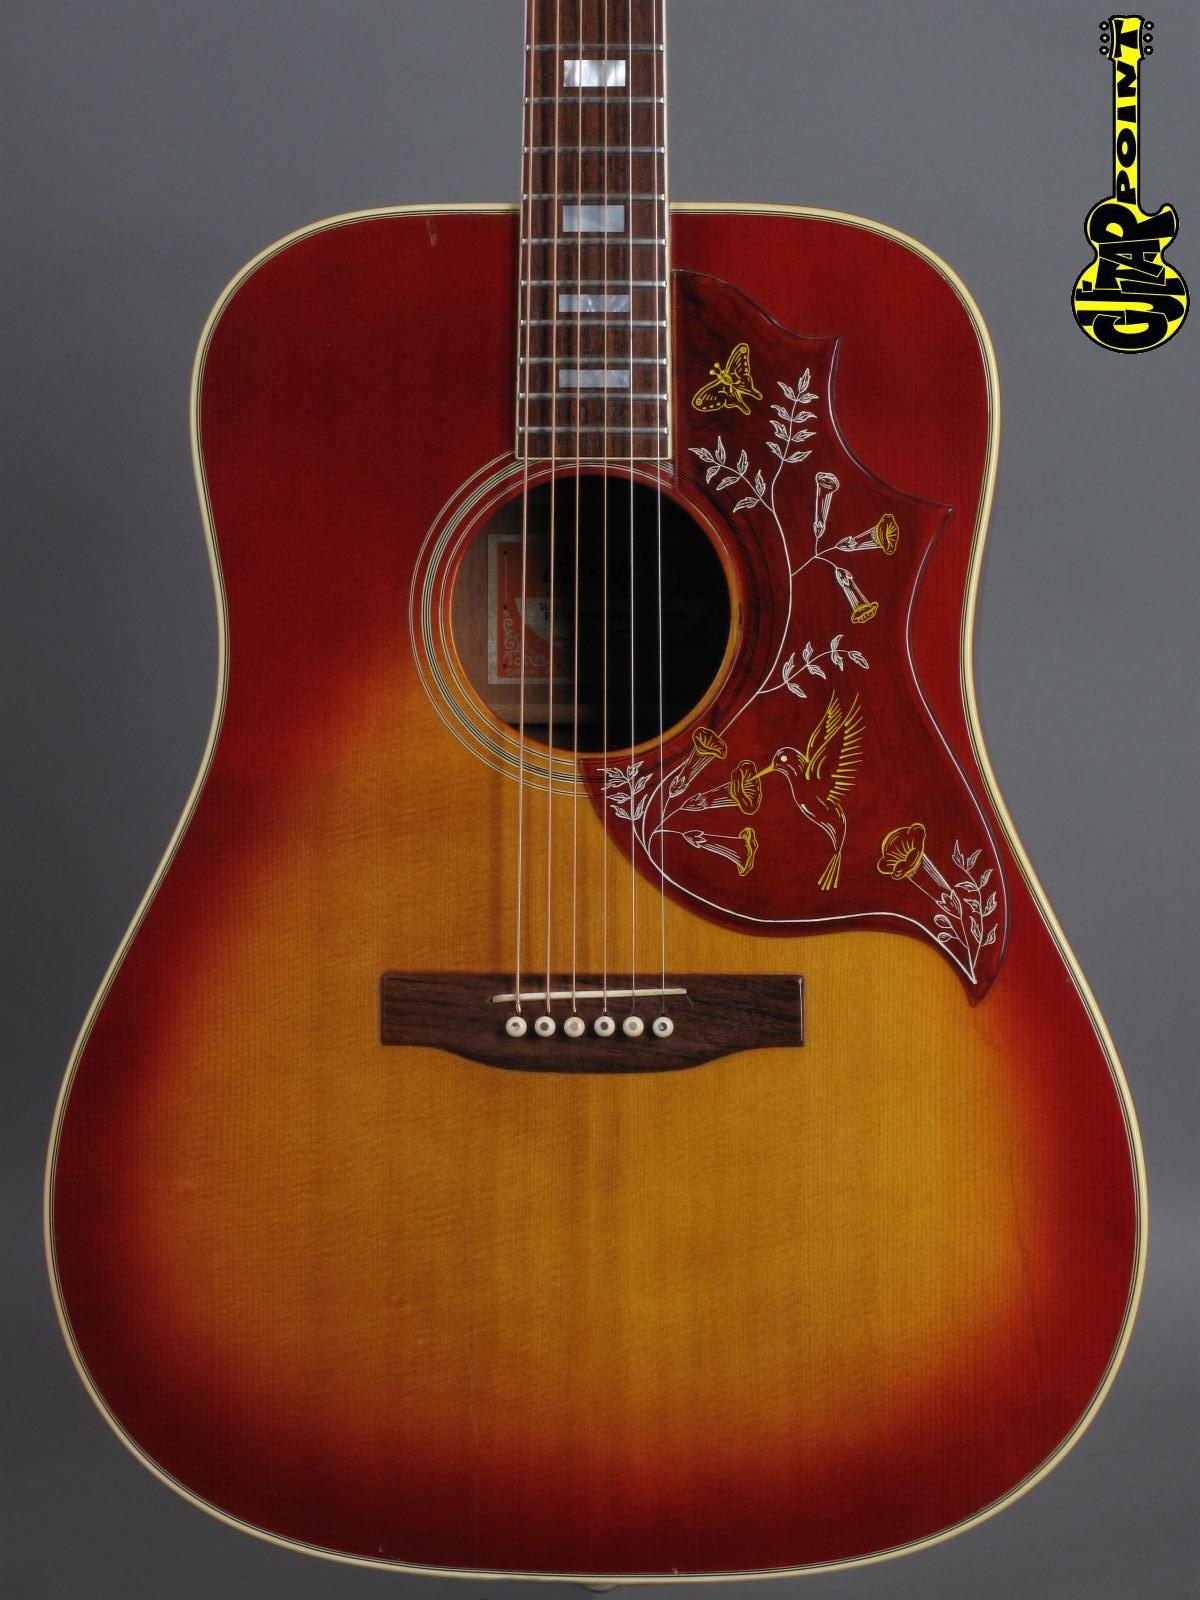 1972 Gibson Hummingbird Custom - Cherry Sunburst